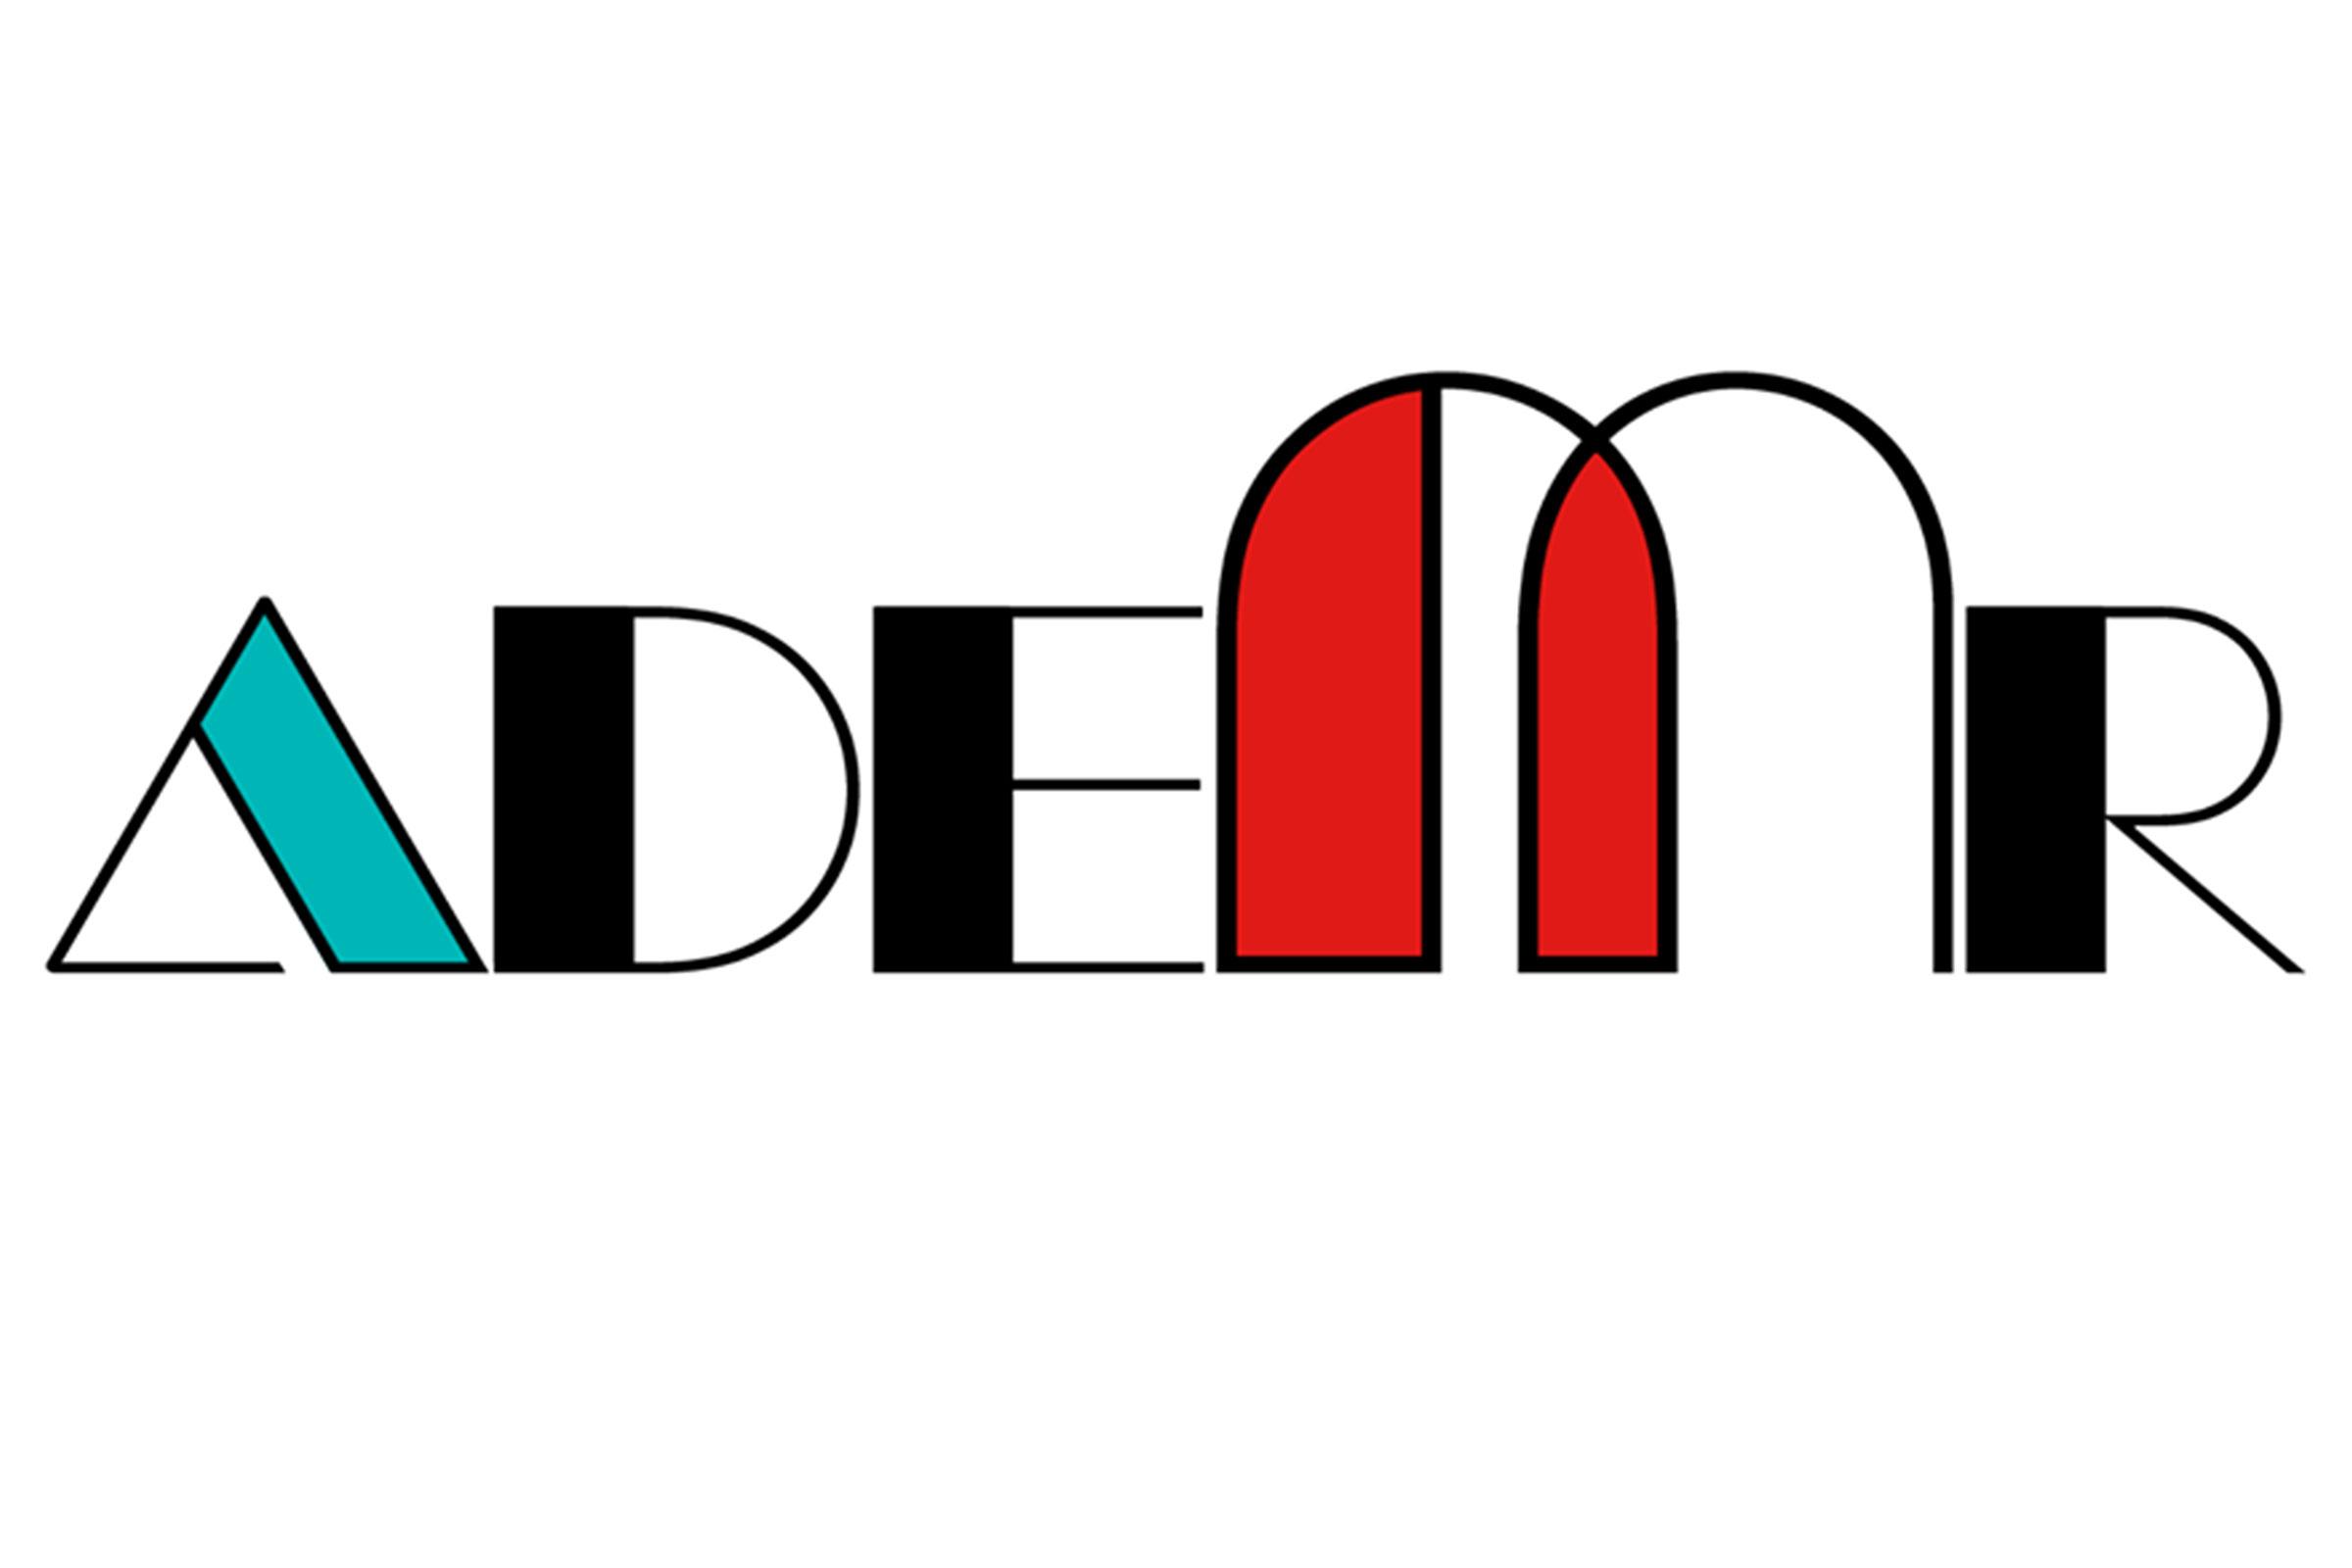 ADEMR logo